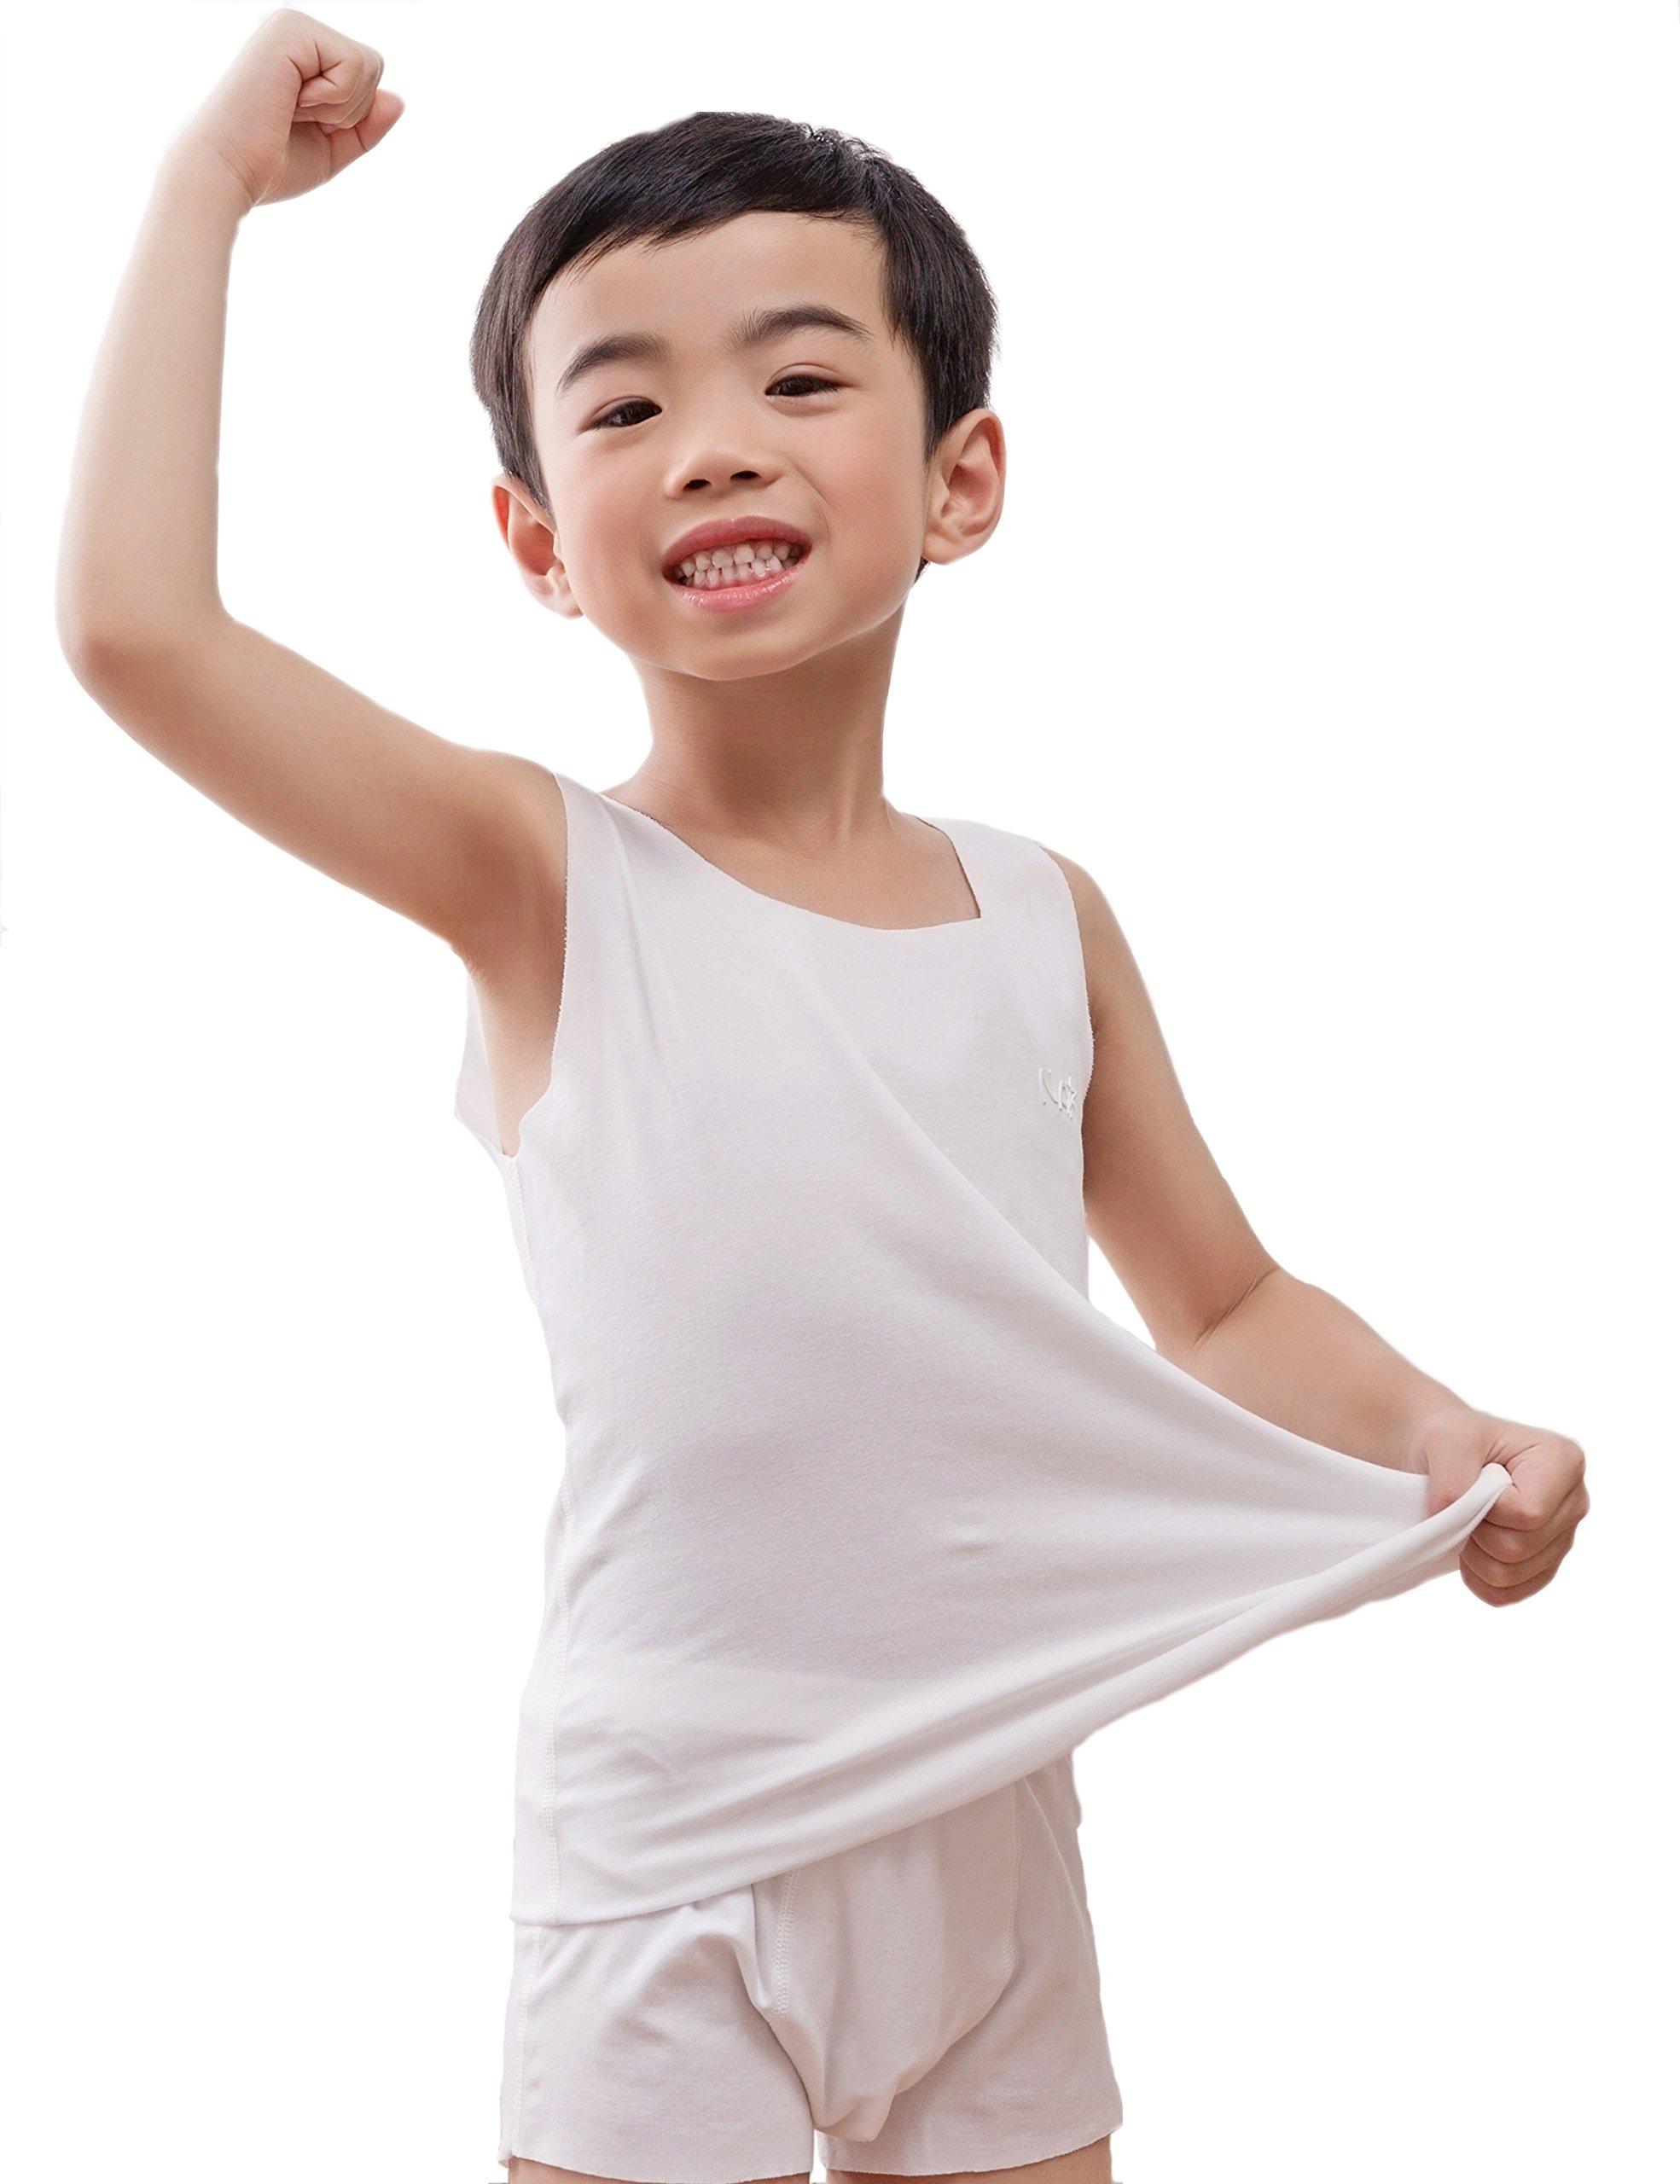 NASSE Boys Cotton Super Soft Sleeveless Undershirts Free-Cut Tank Tops (M, White)